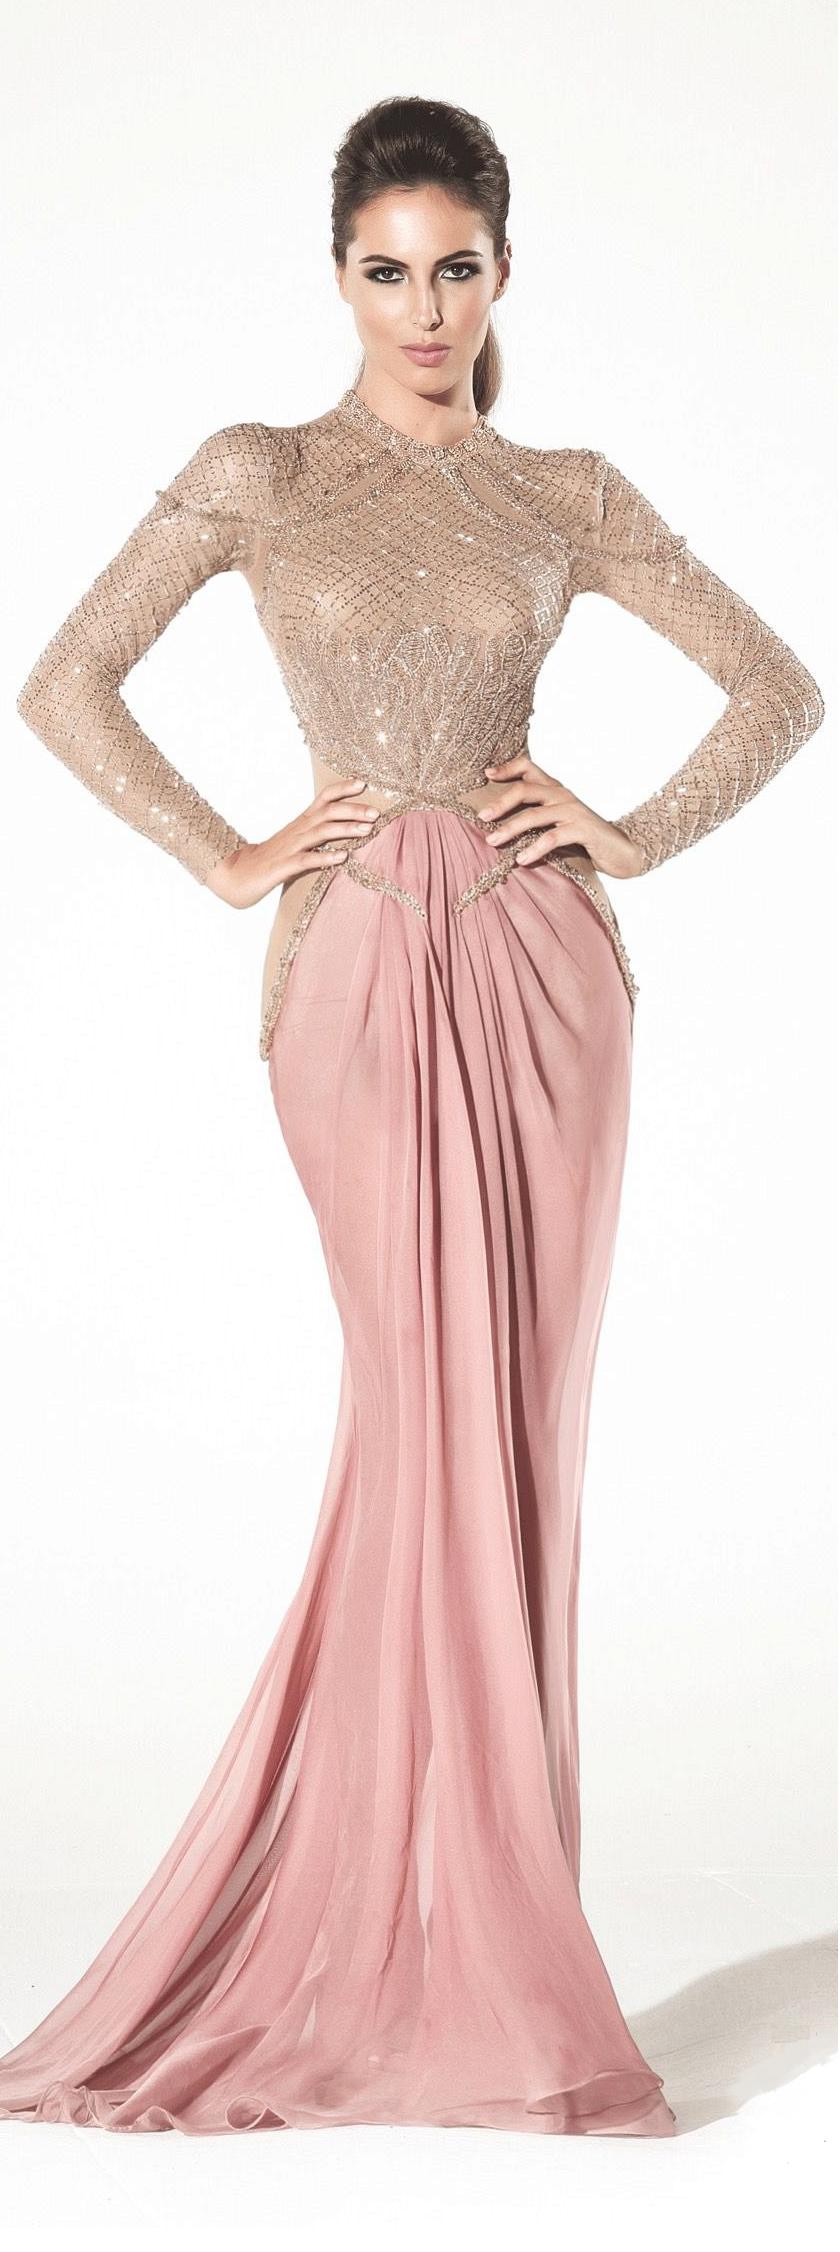 charbel zoe couture | Alta costura | Pinterest | Vestiditos ...